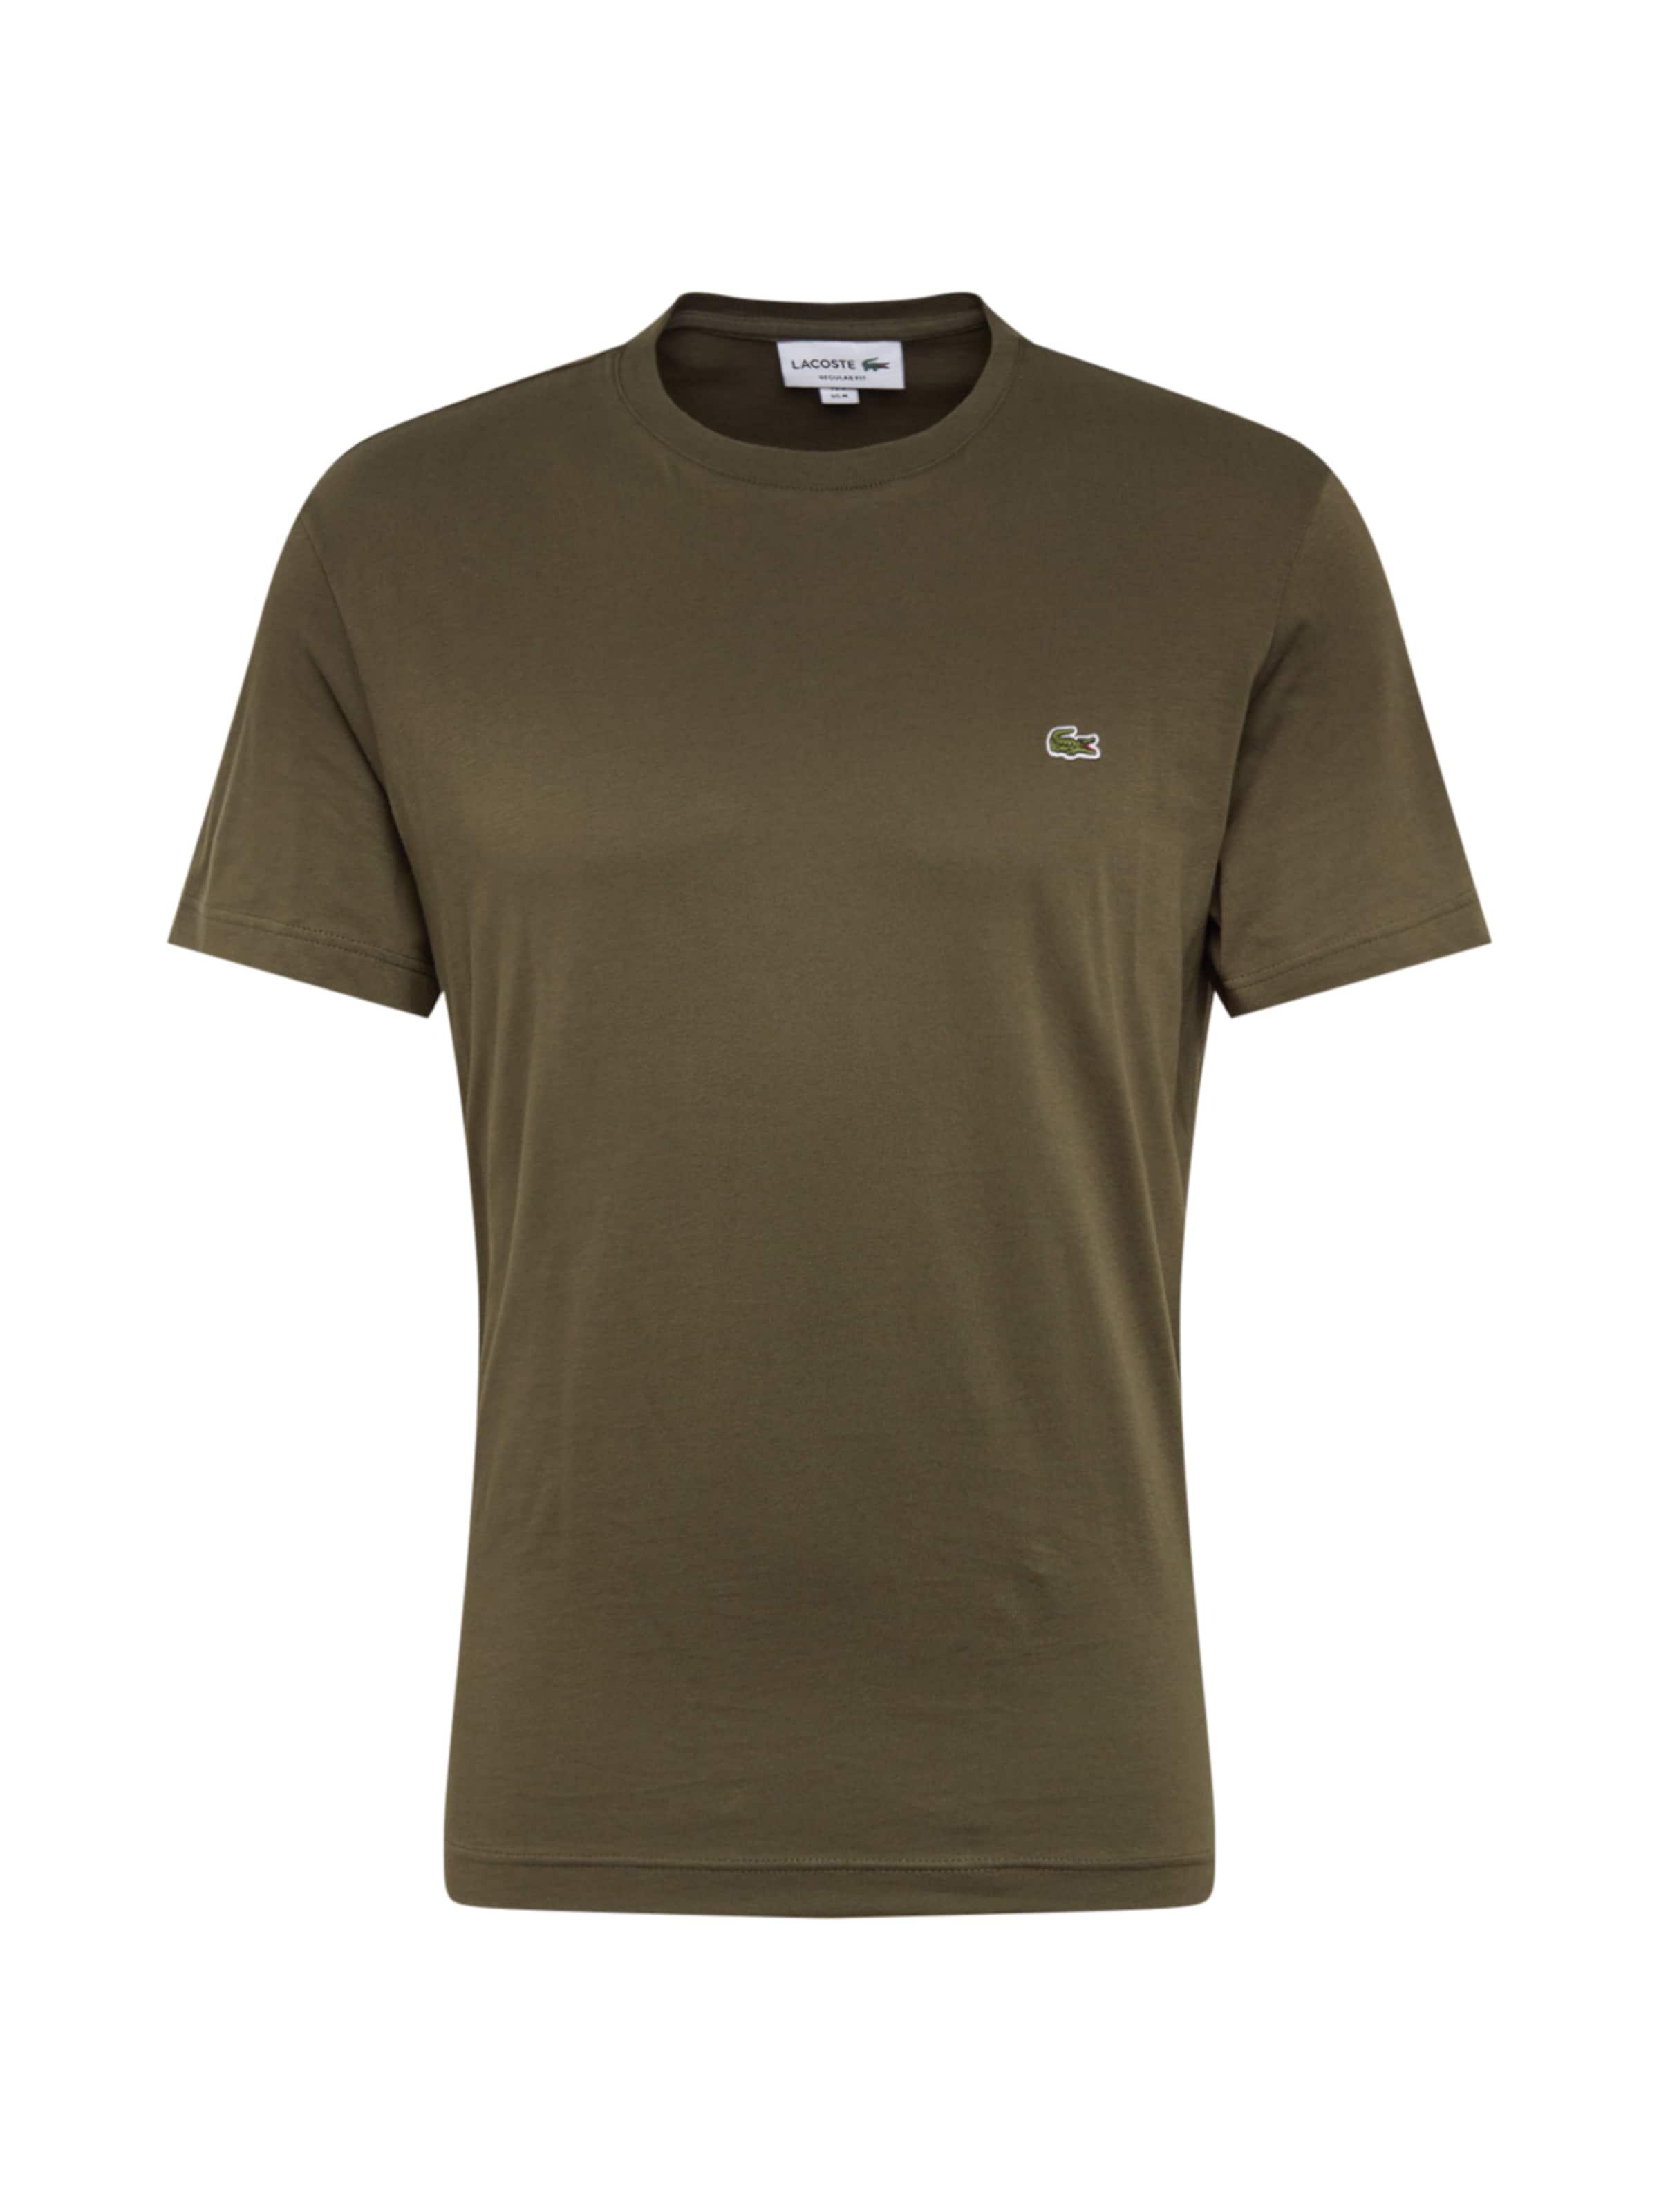 Grün In Lacoste Lacoste Shirt Shirt Grün In Lacoste Shirt In n08wvmN